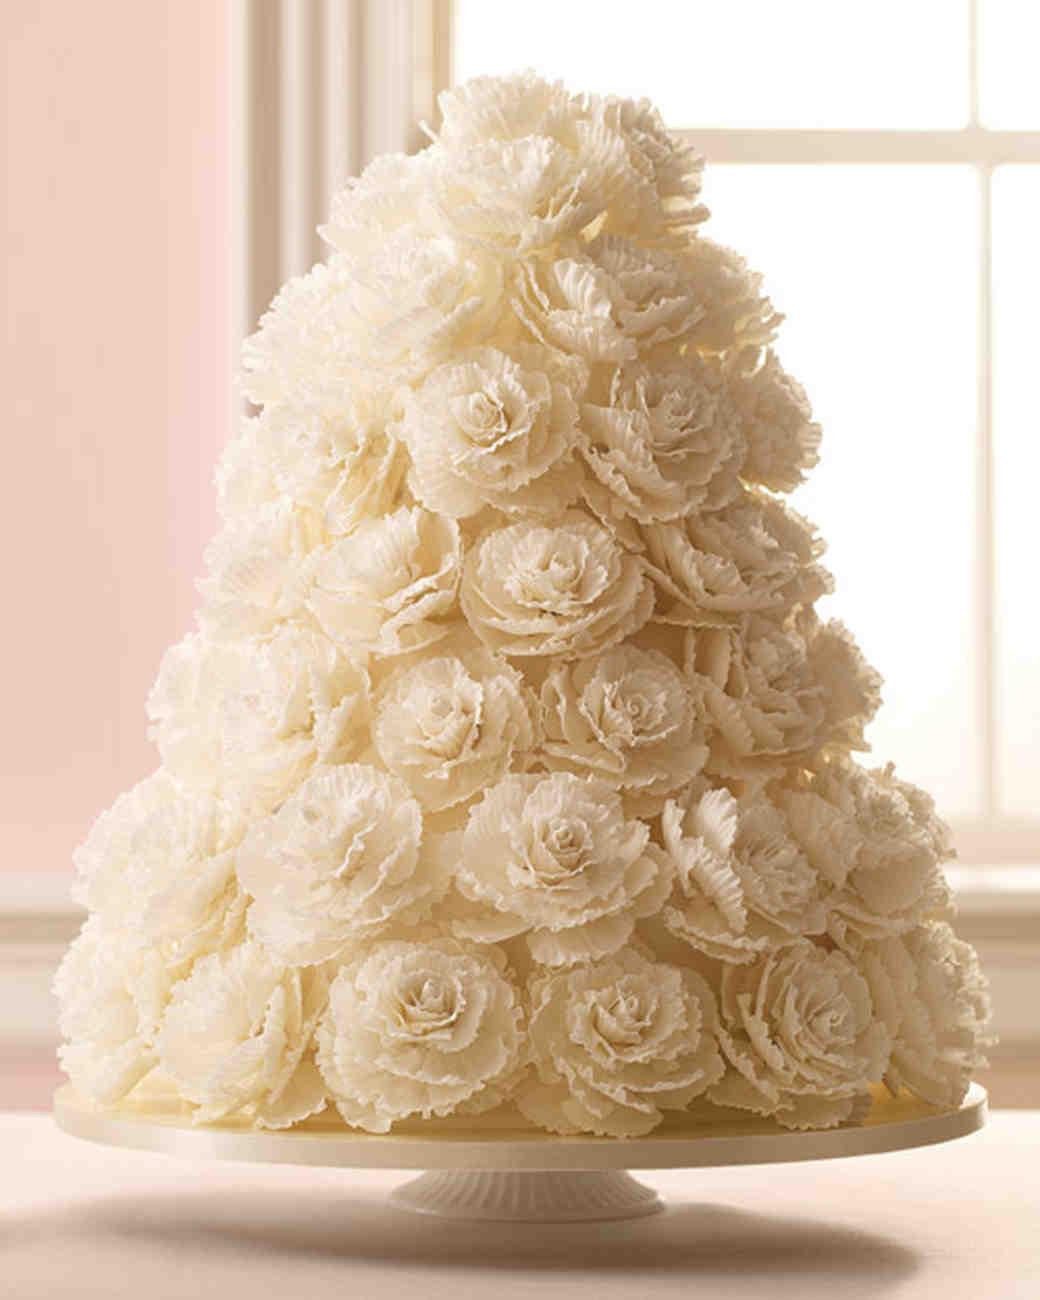 Martha Stewart Wedding Cakes  50 Great Wedding Cakes